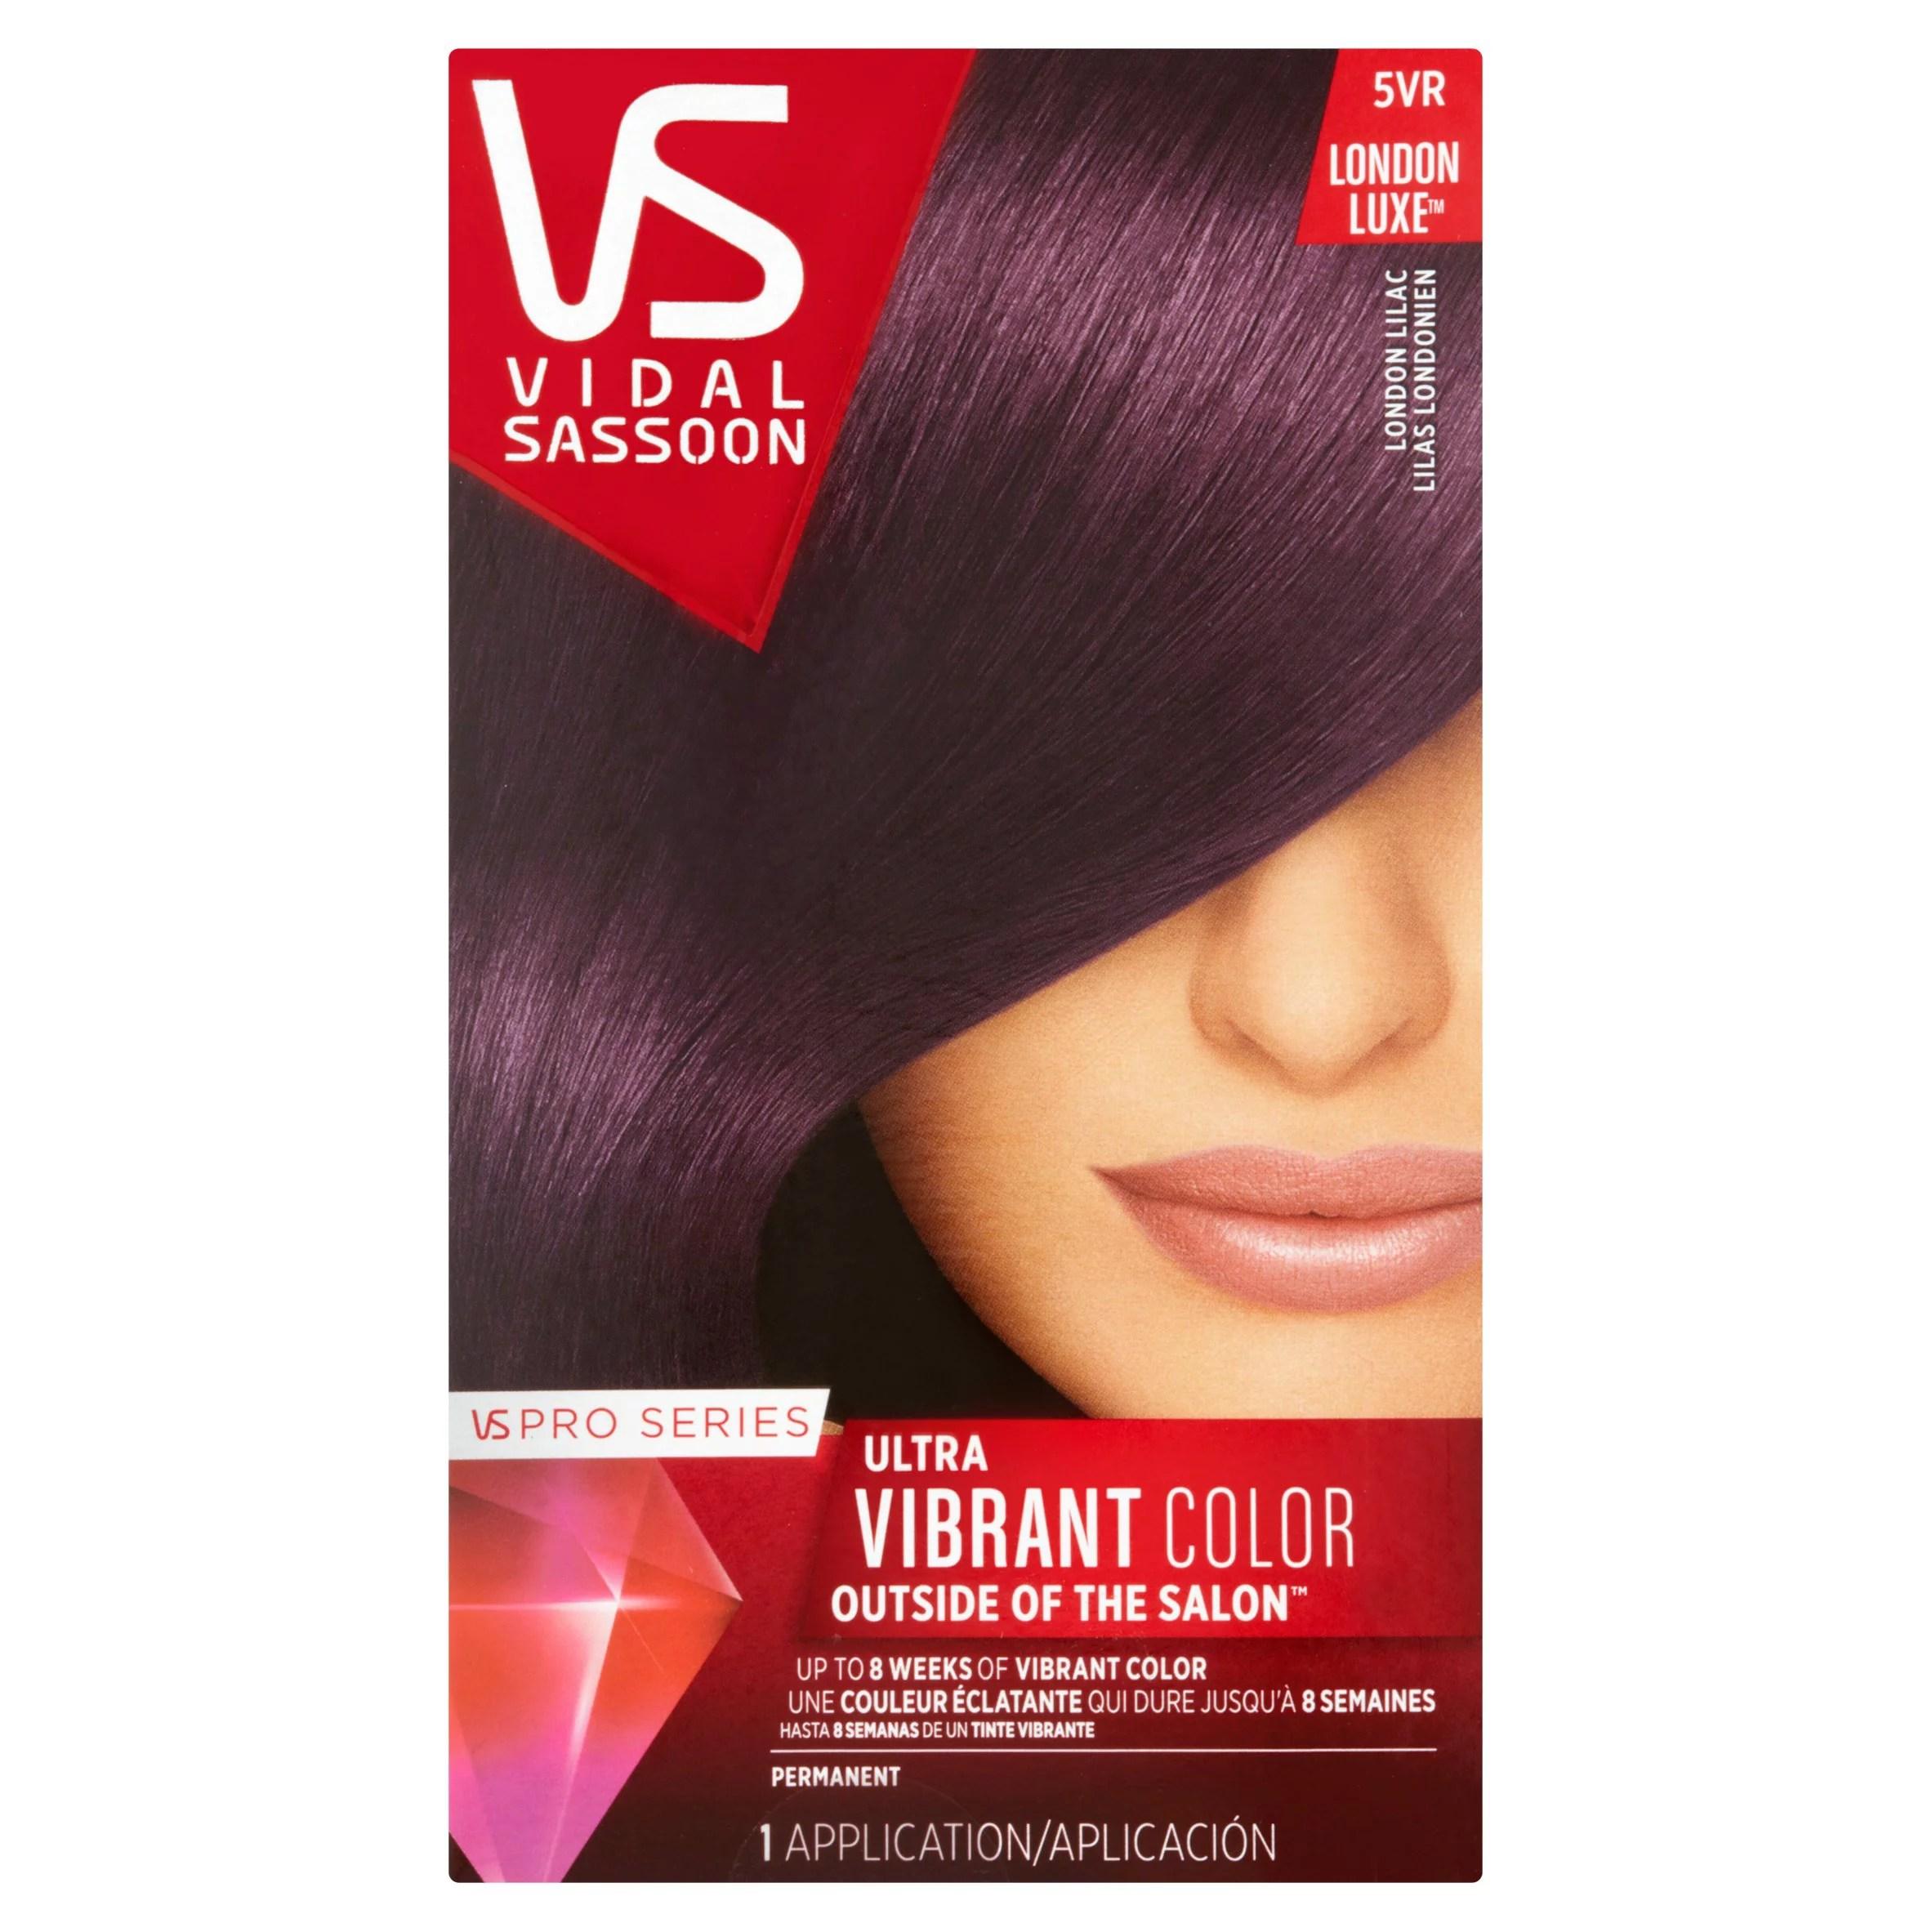 Vidal Sassoon Pro Series Hair Color 5VR London Lilac